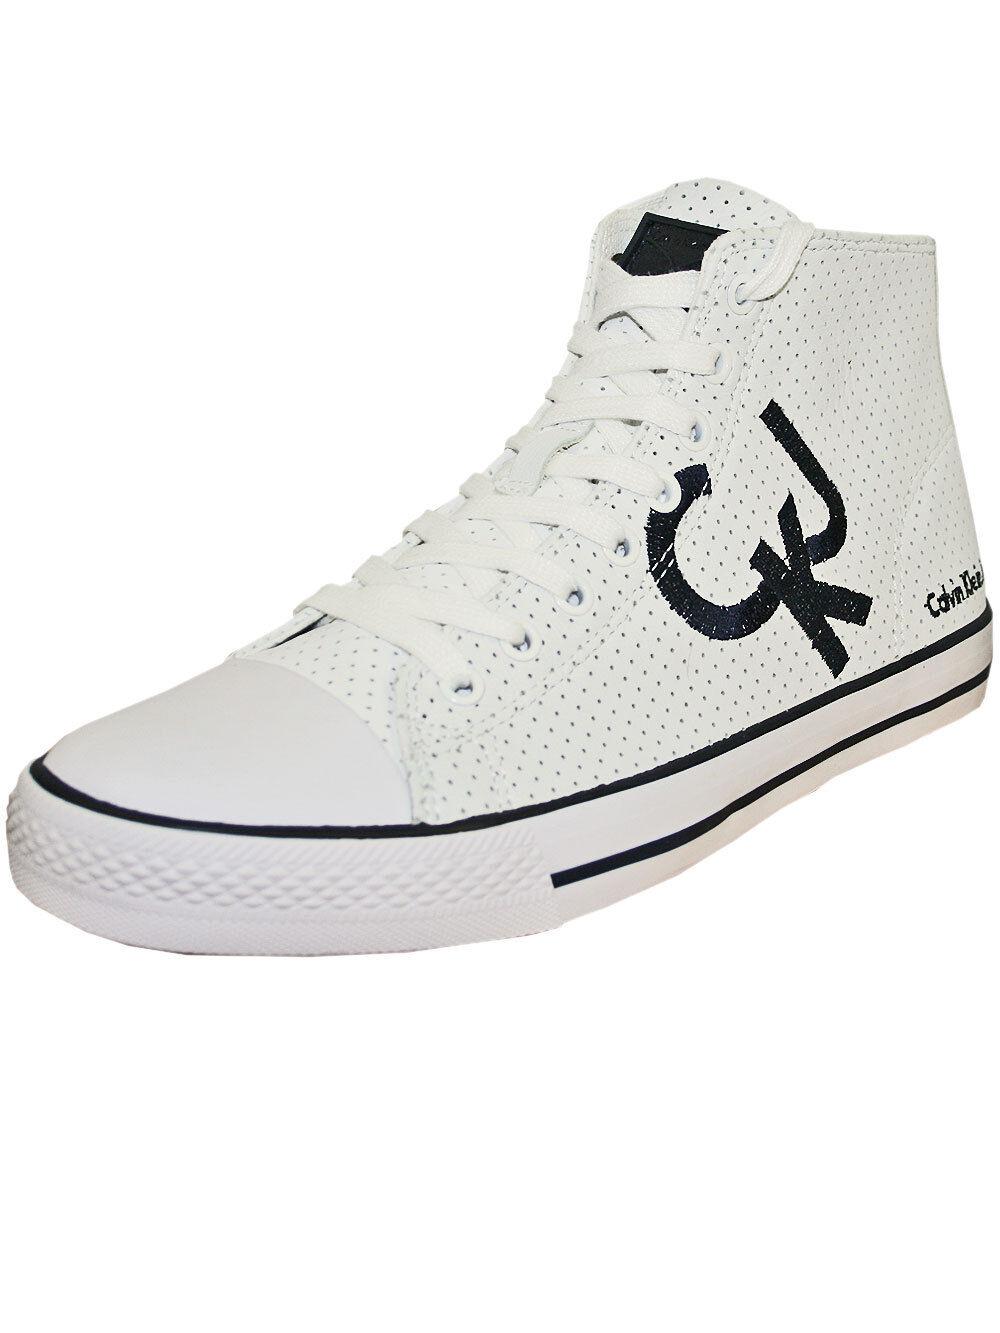 Calvin Klein Jeans Herren Leder Sneaker Schuhe High *Dawson* in Weiss Neu+OVP!